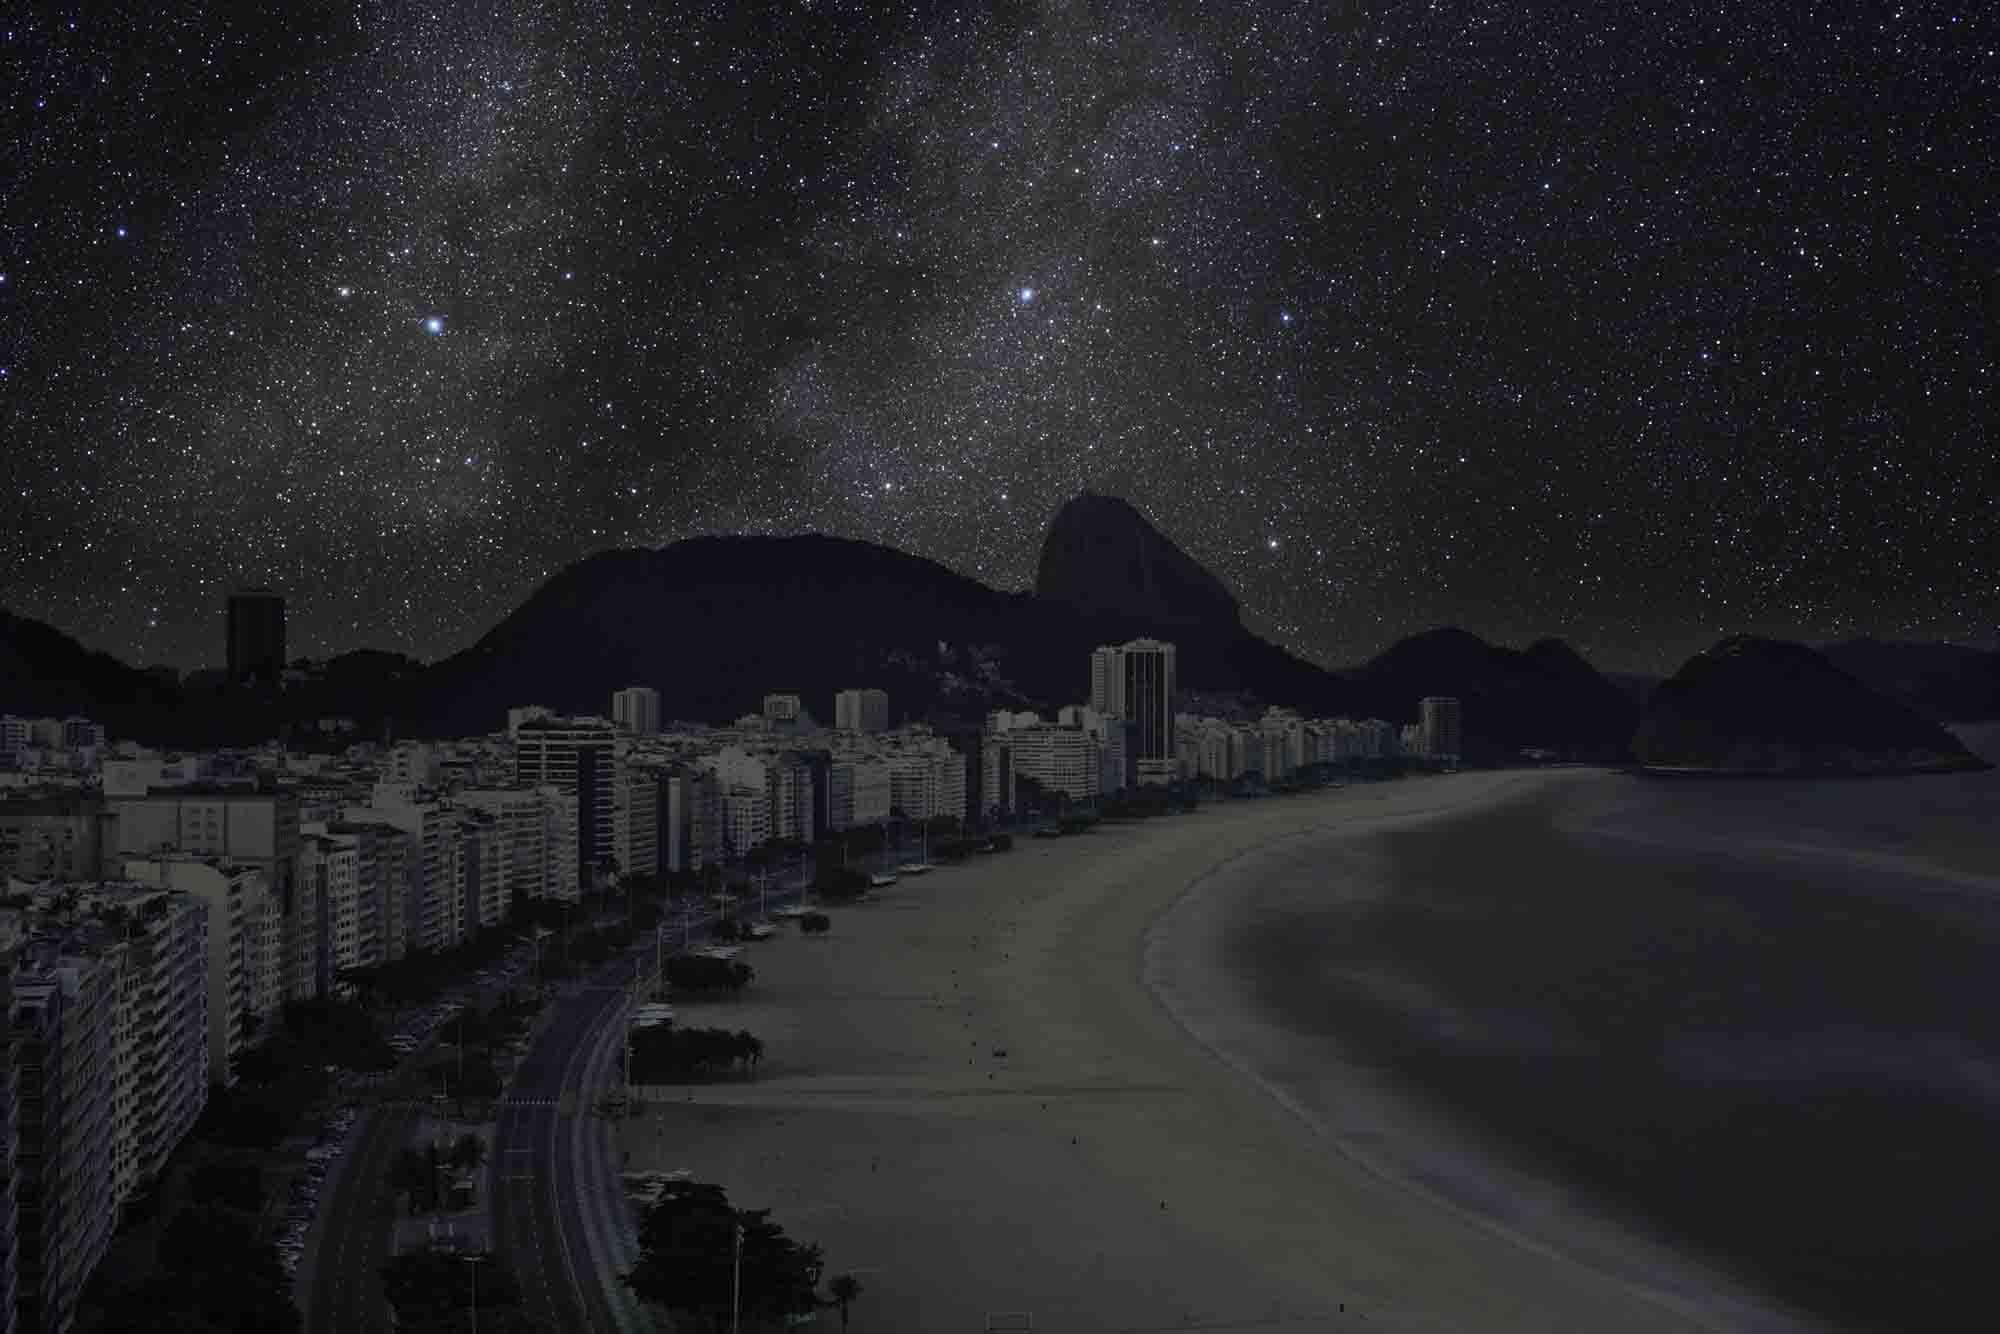 Rio de Janeiro 22° 58' 38'' S 2011-06-04 lst 15:08<br/>Darkened Cities - Villes éteintes